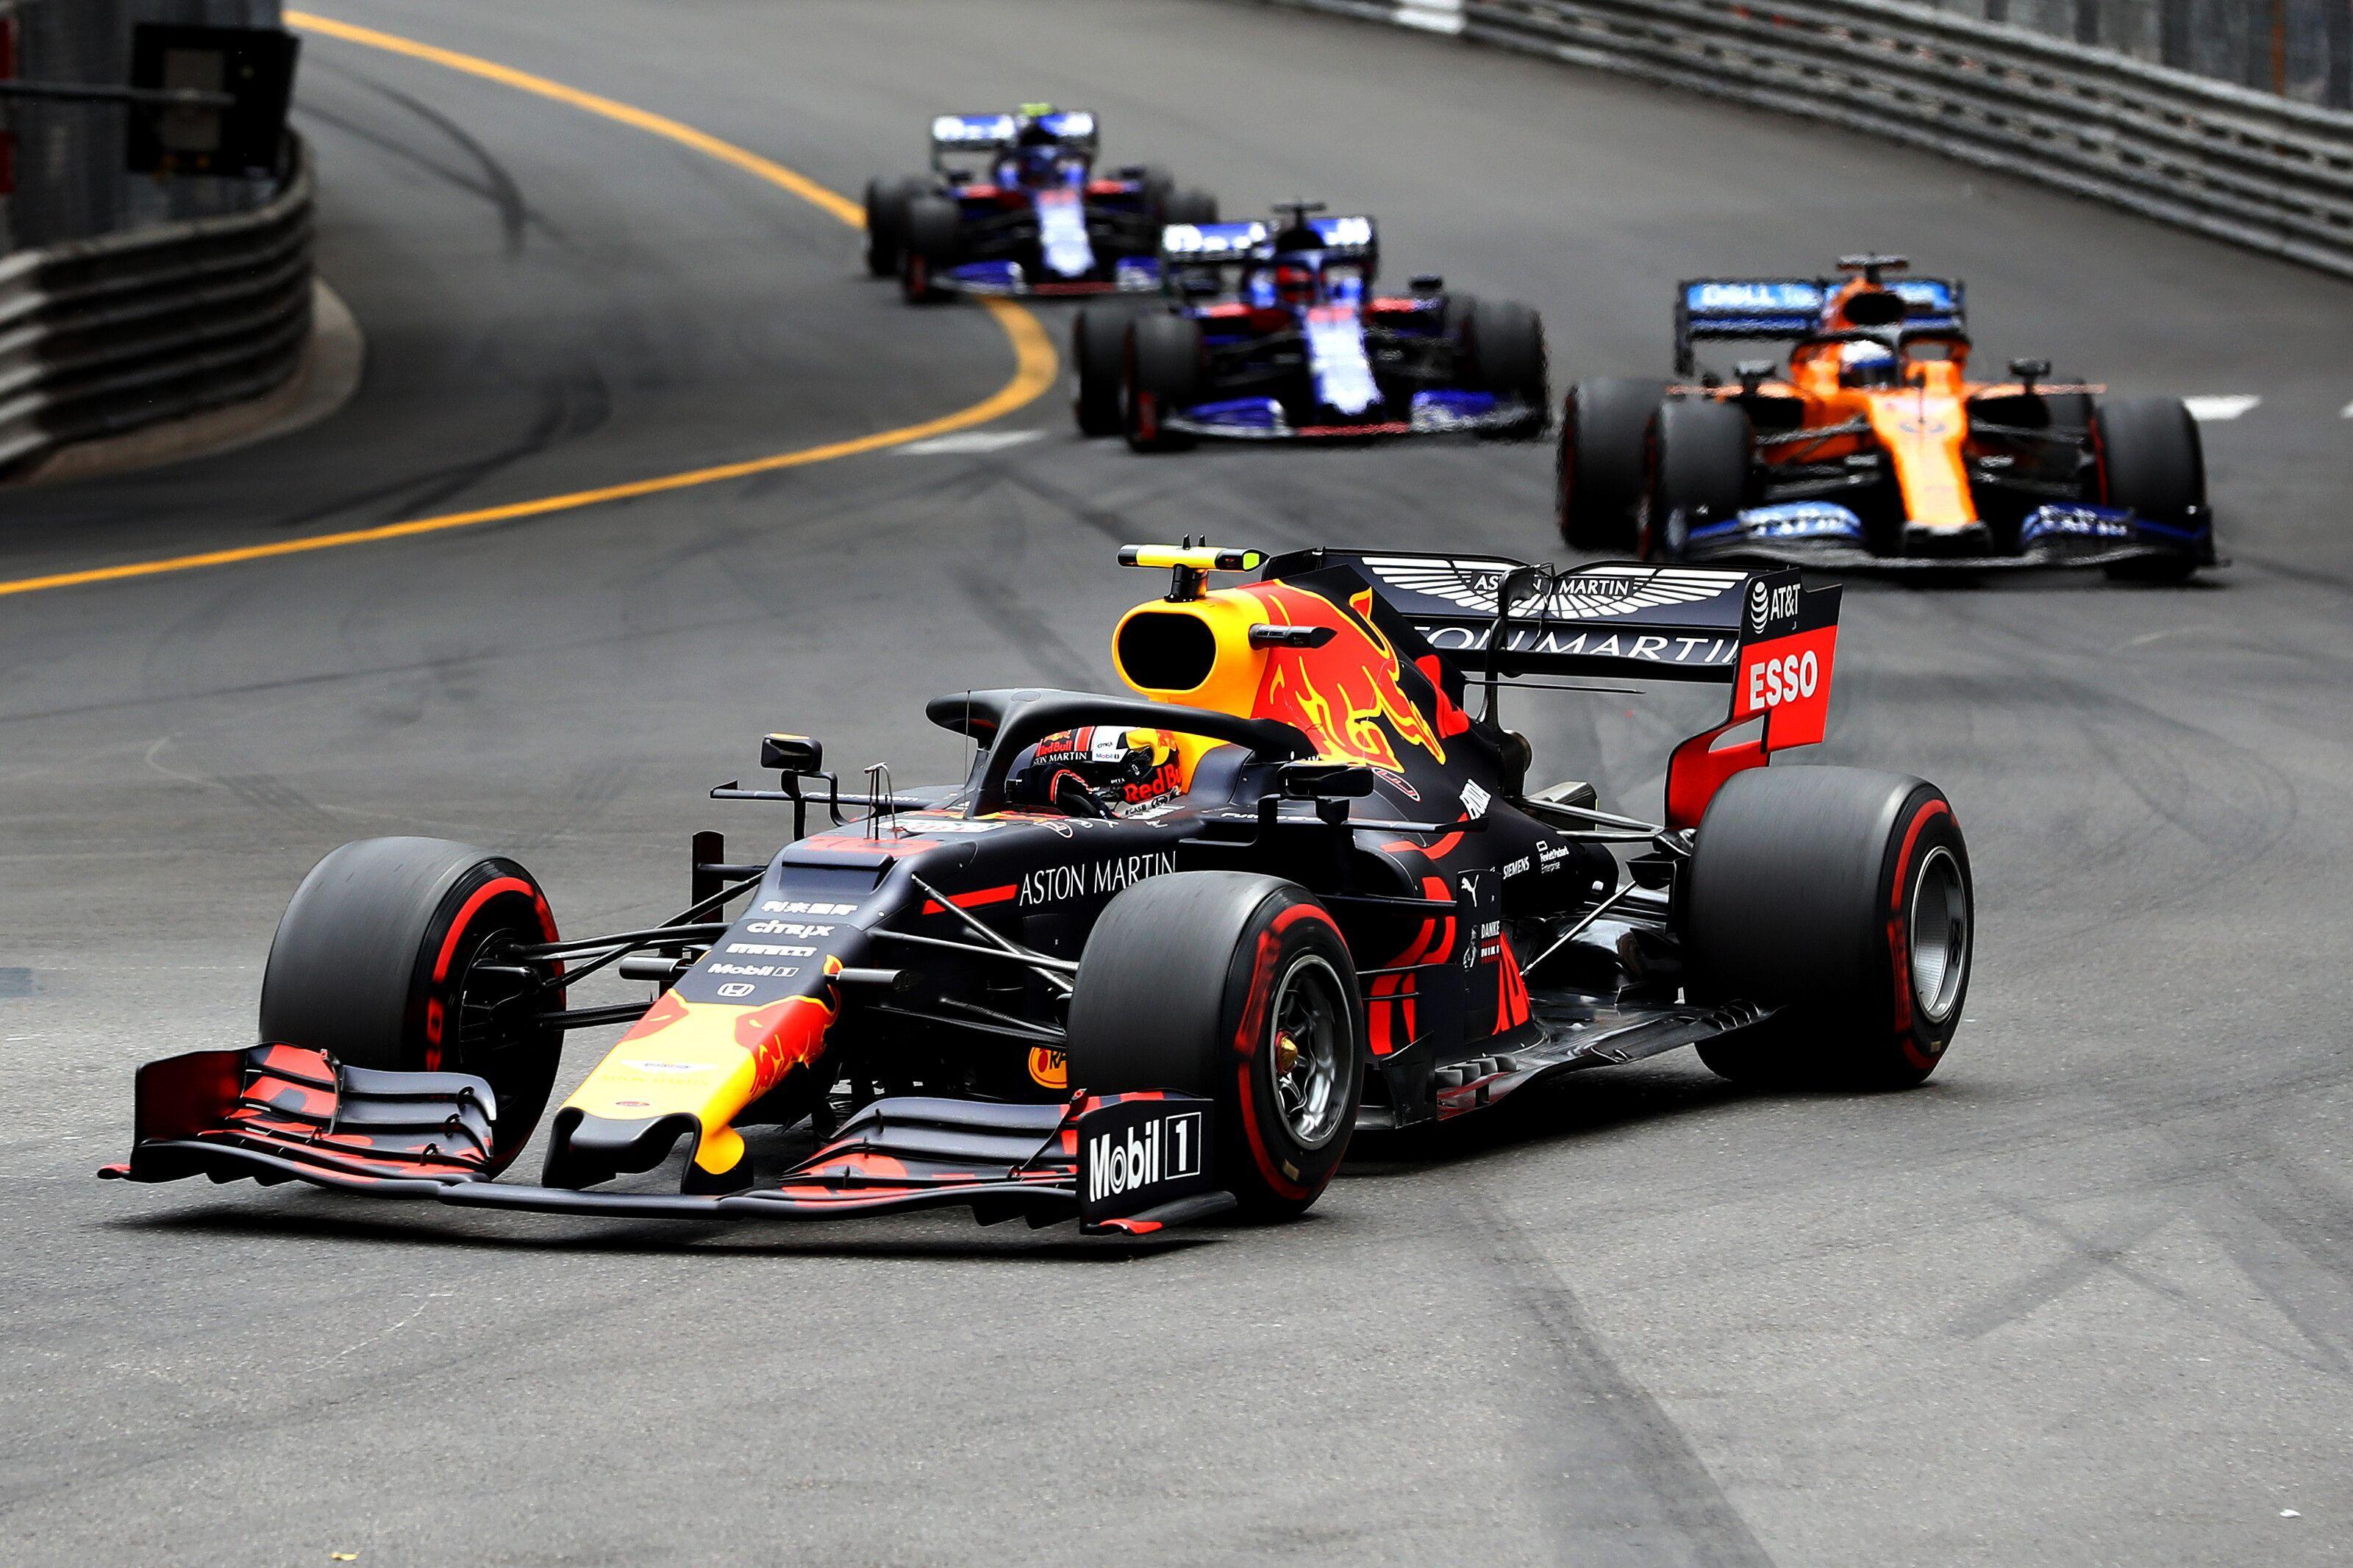 Ross Brawn hails Red Bull, Toro Rosso work with Honda F1